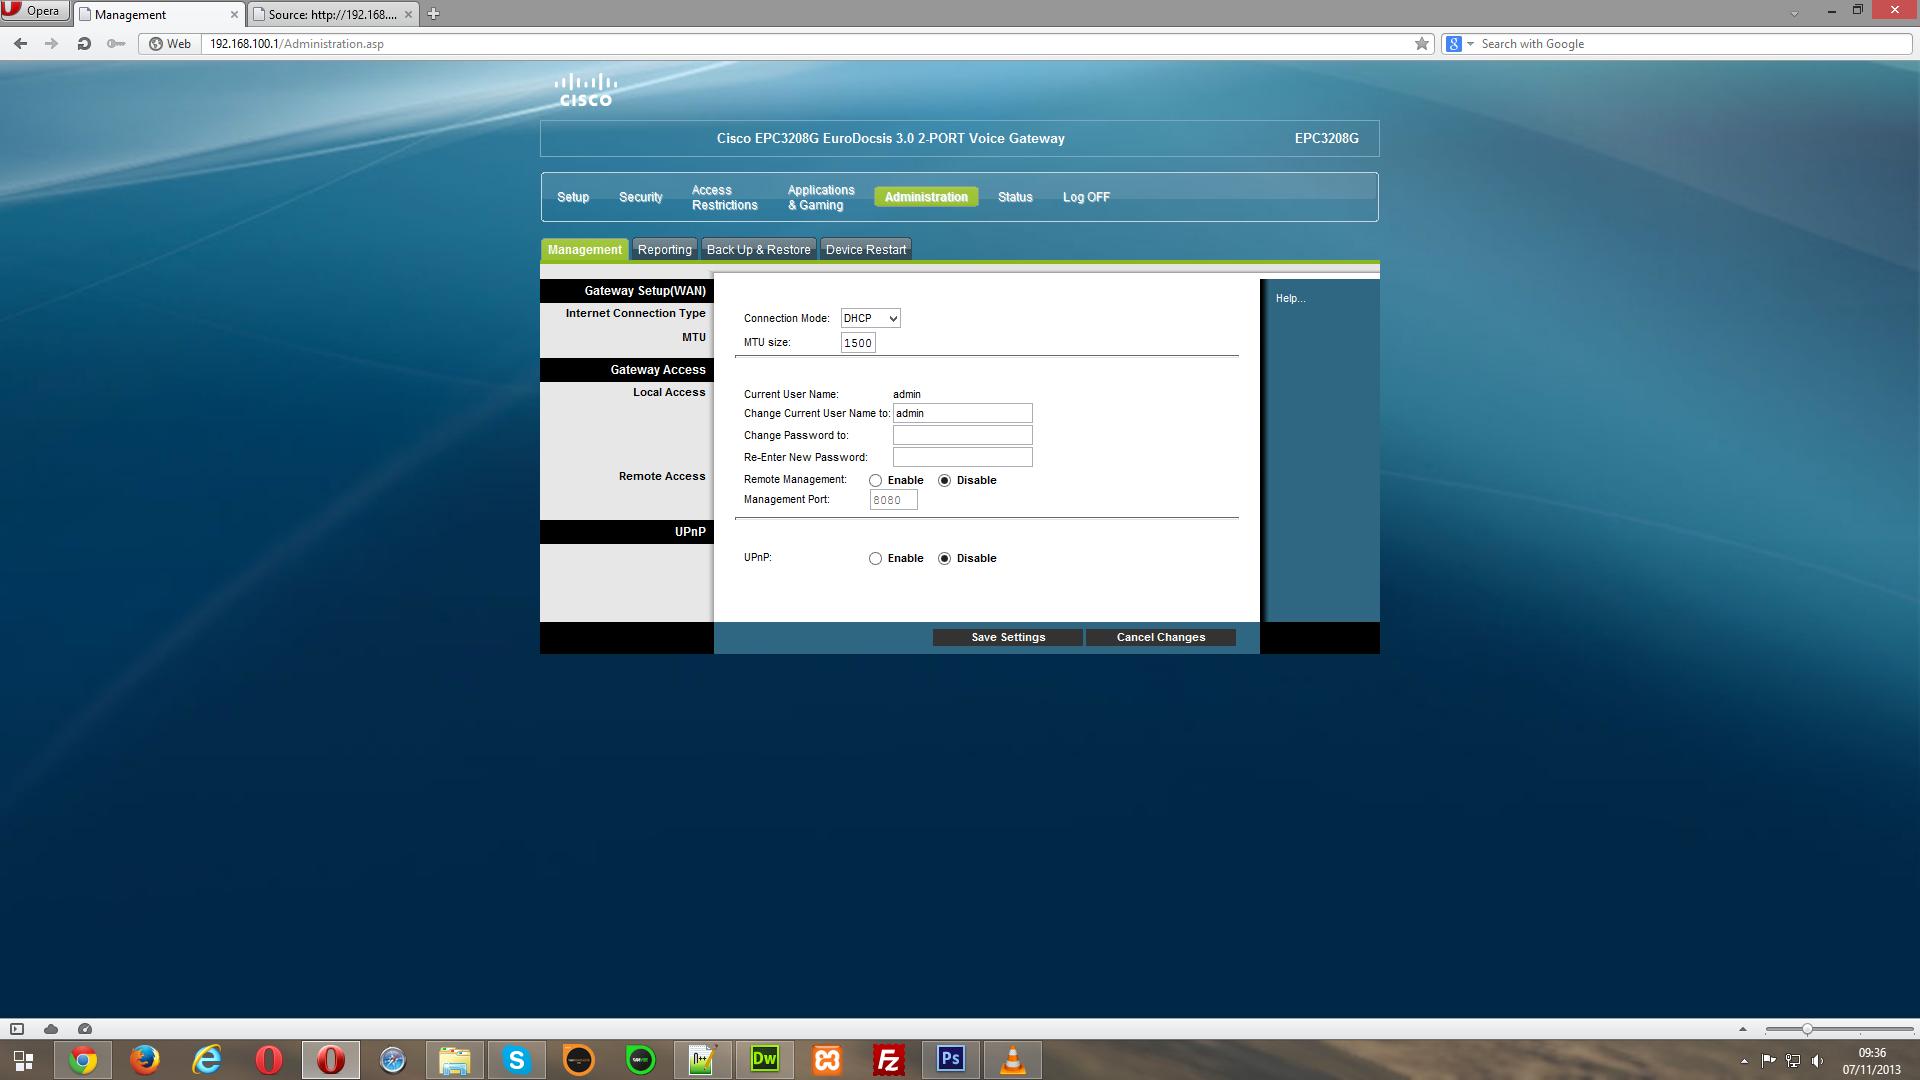 Epc3925 firmware bridge mode